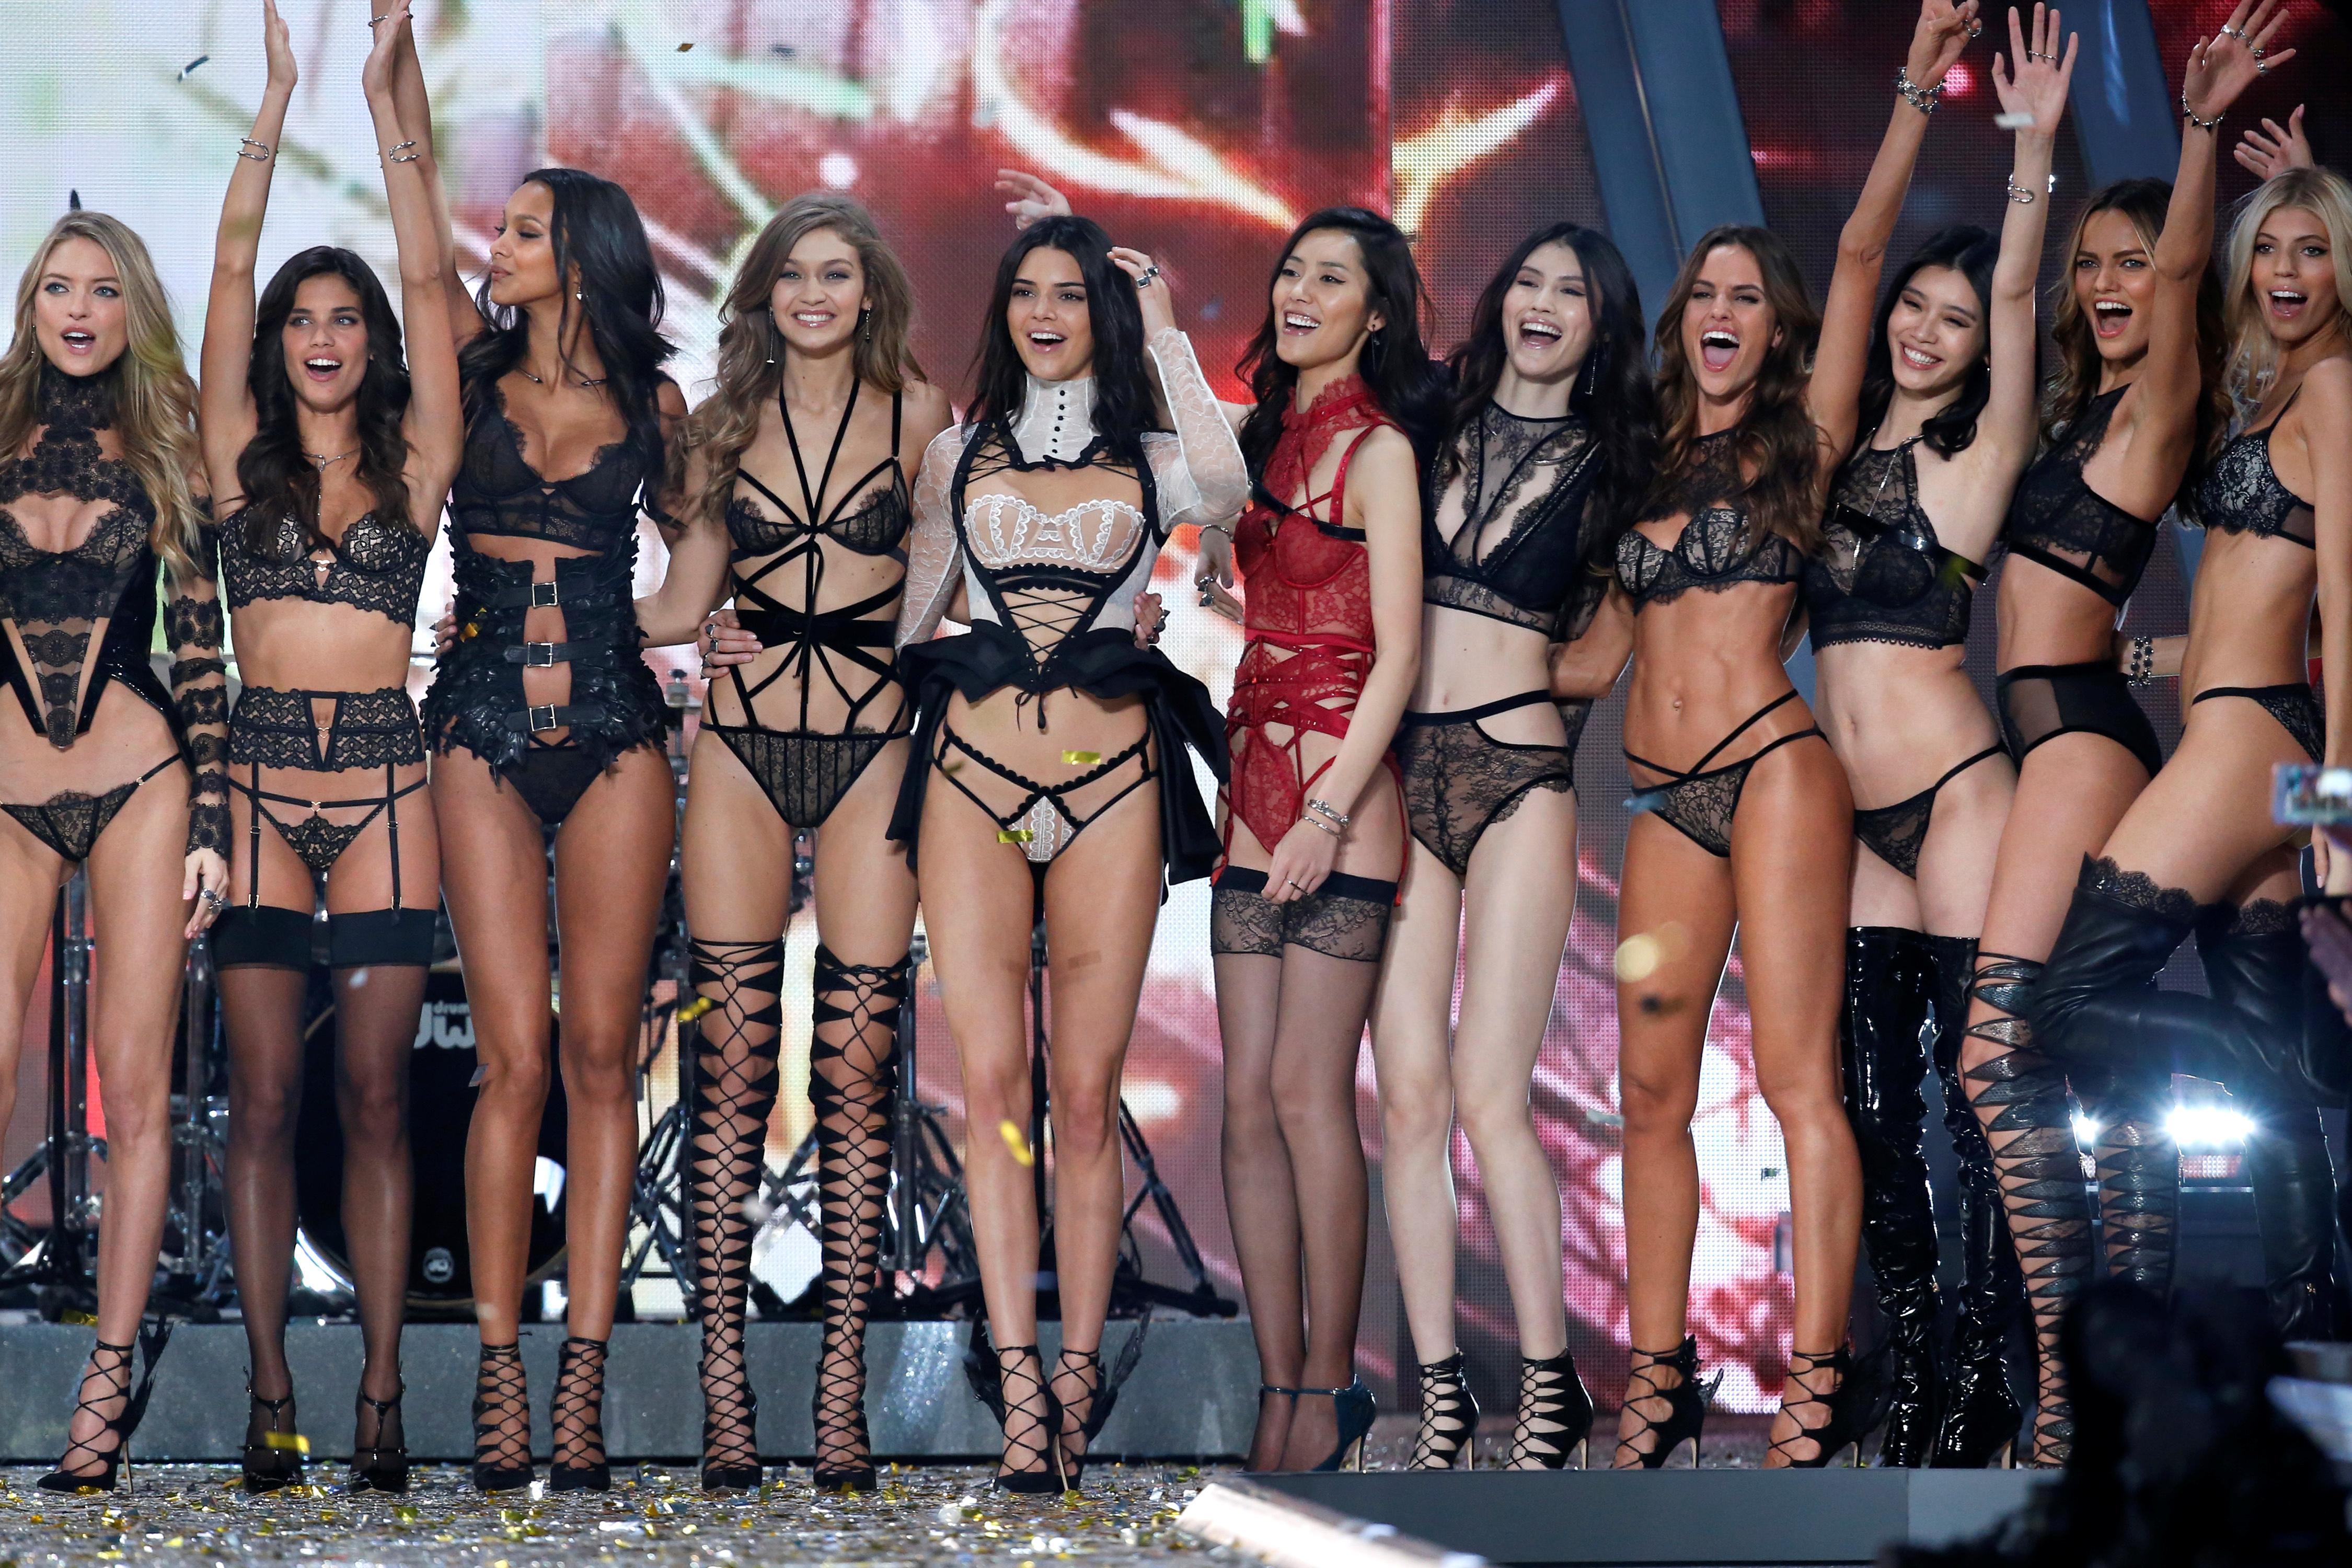 Victoria's Secret's porny fashion show won't help the failing brand's image